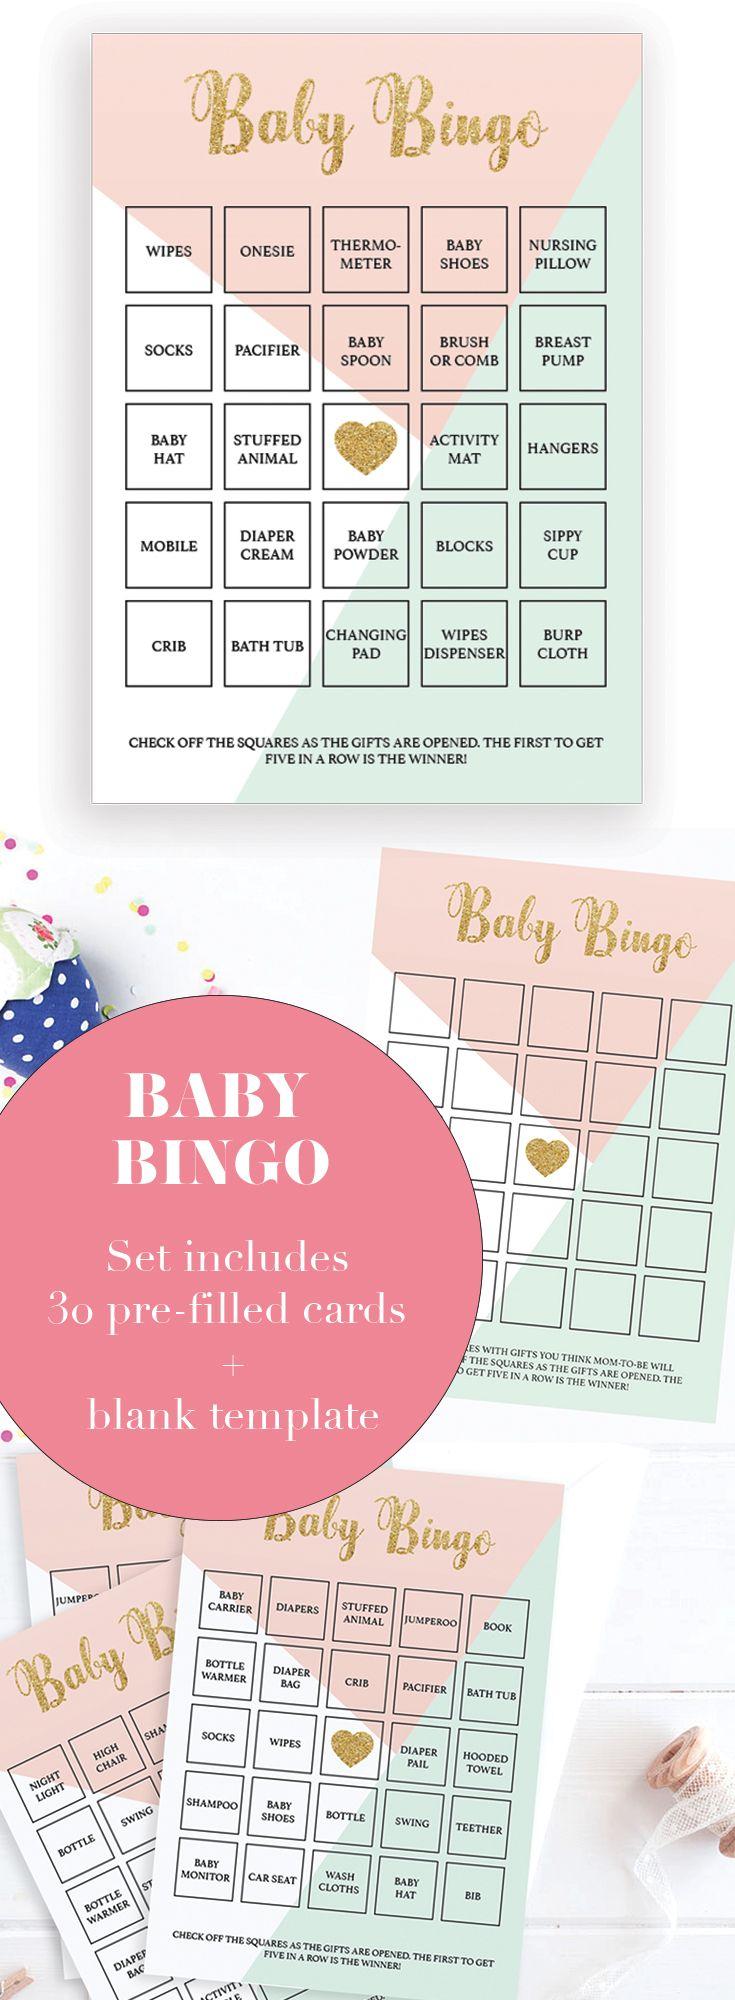 Baby Bingo Template Free Printable ] - Printable Snowman